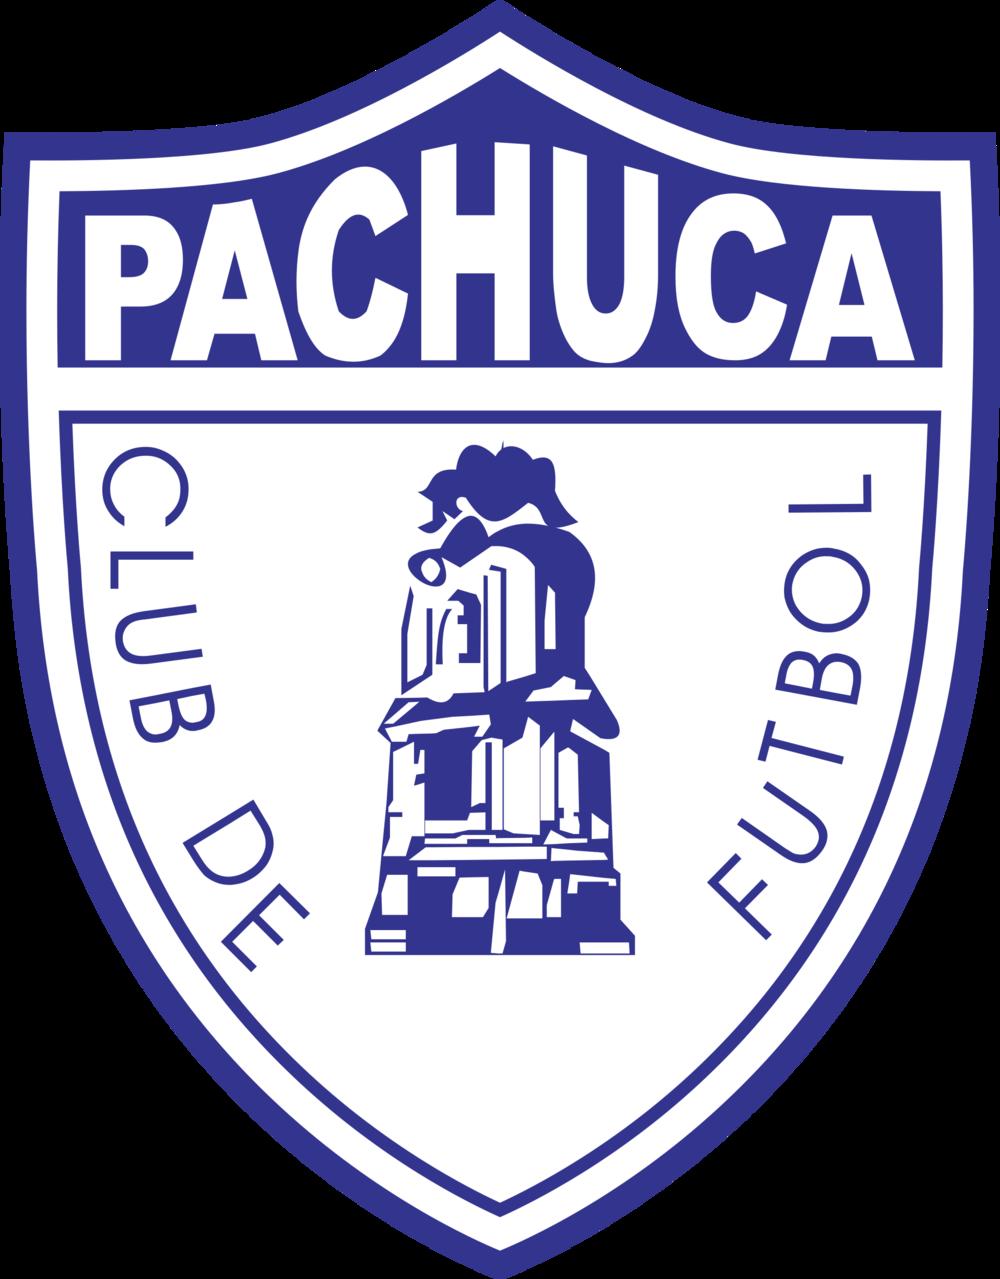 pachuca.png